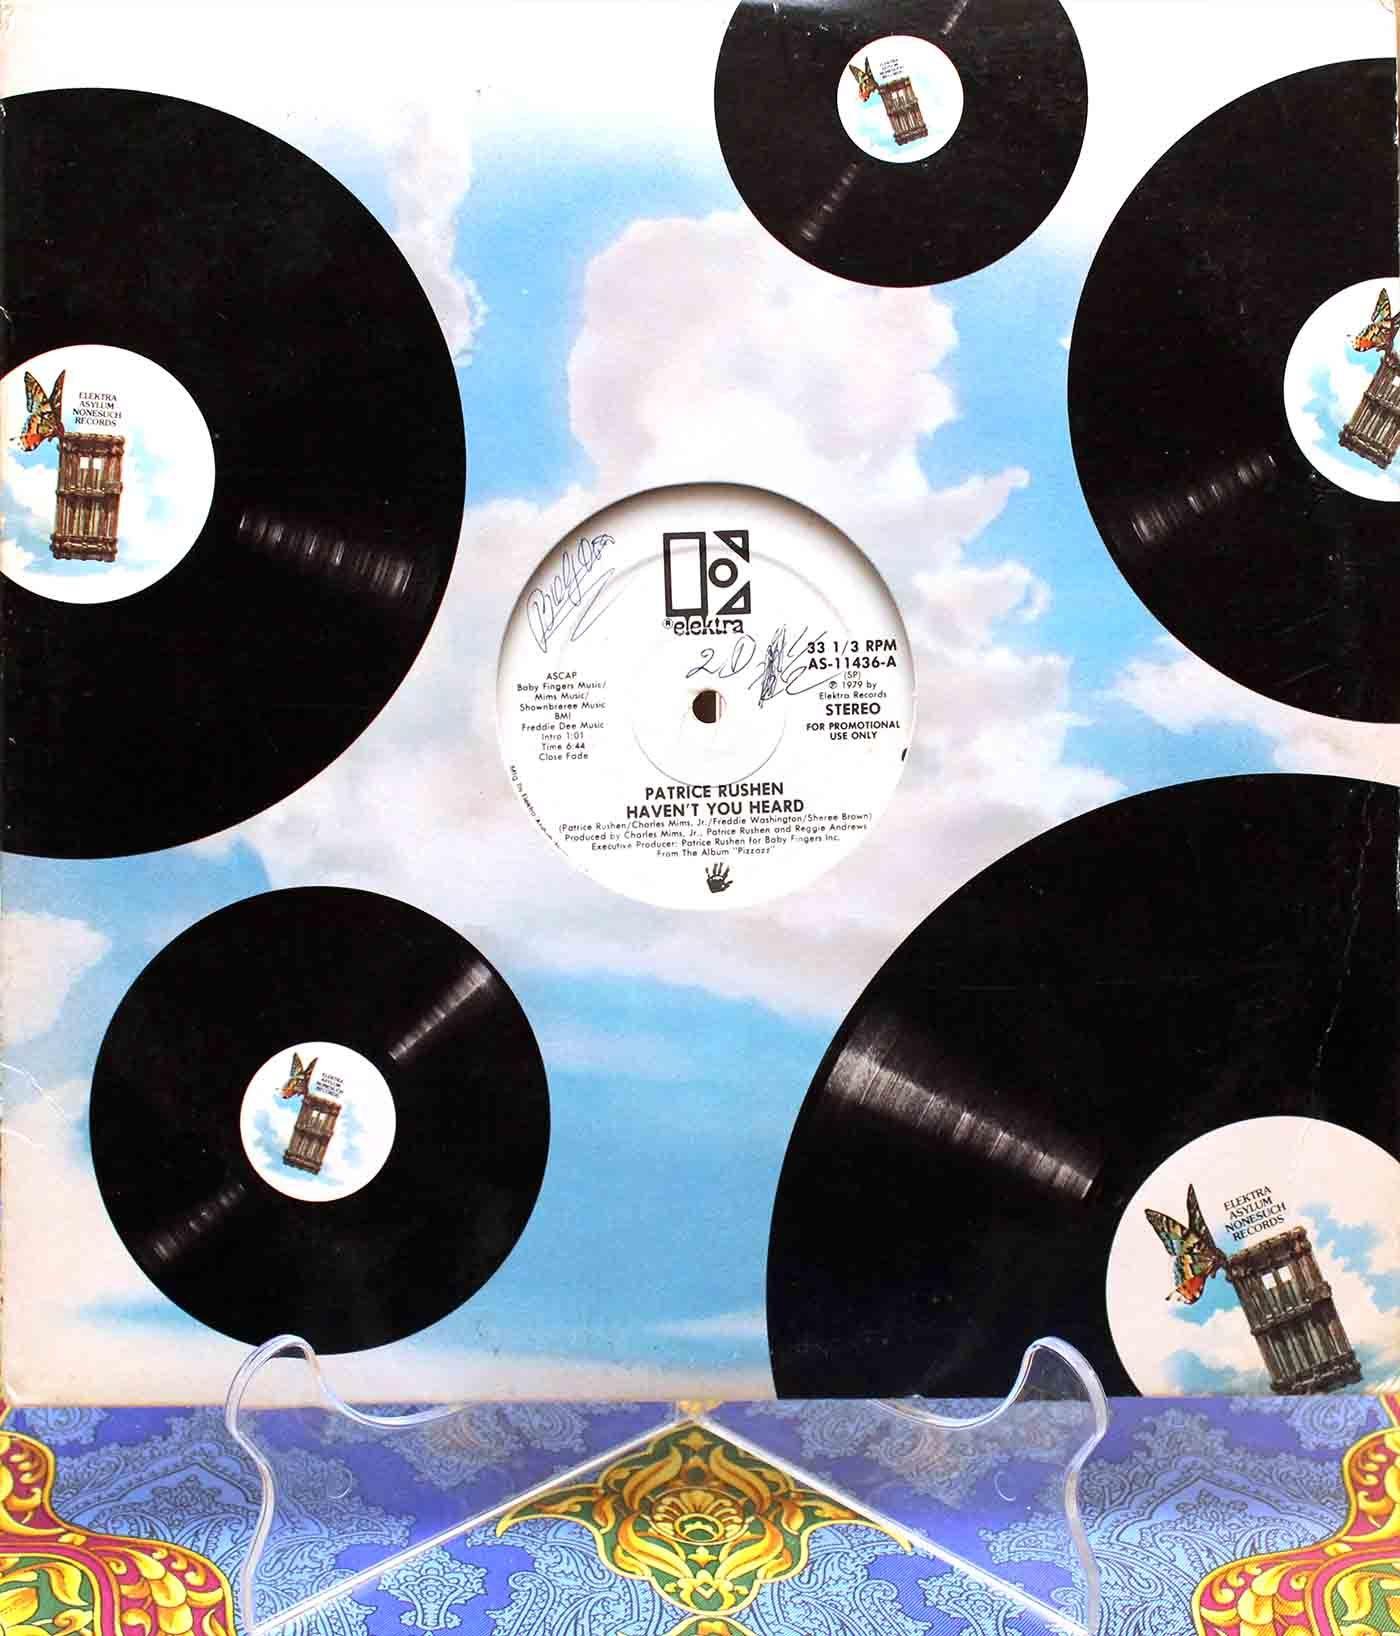 Patrice Rushen – Havent You Heard 01